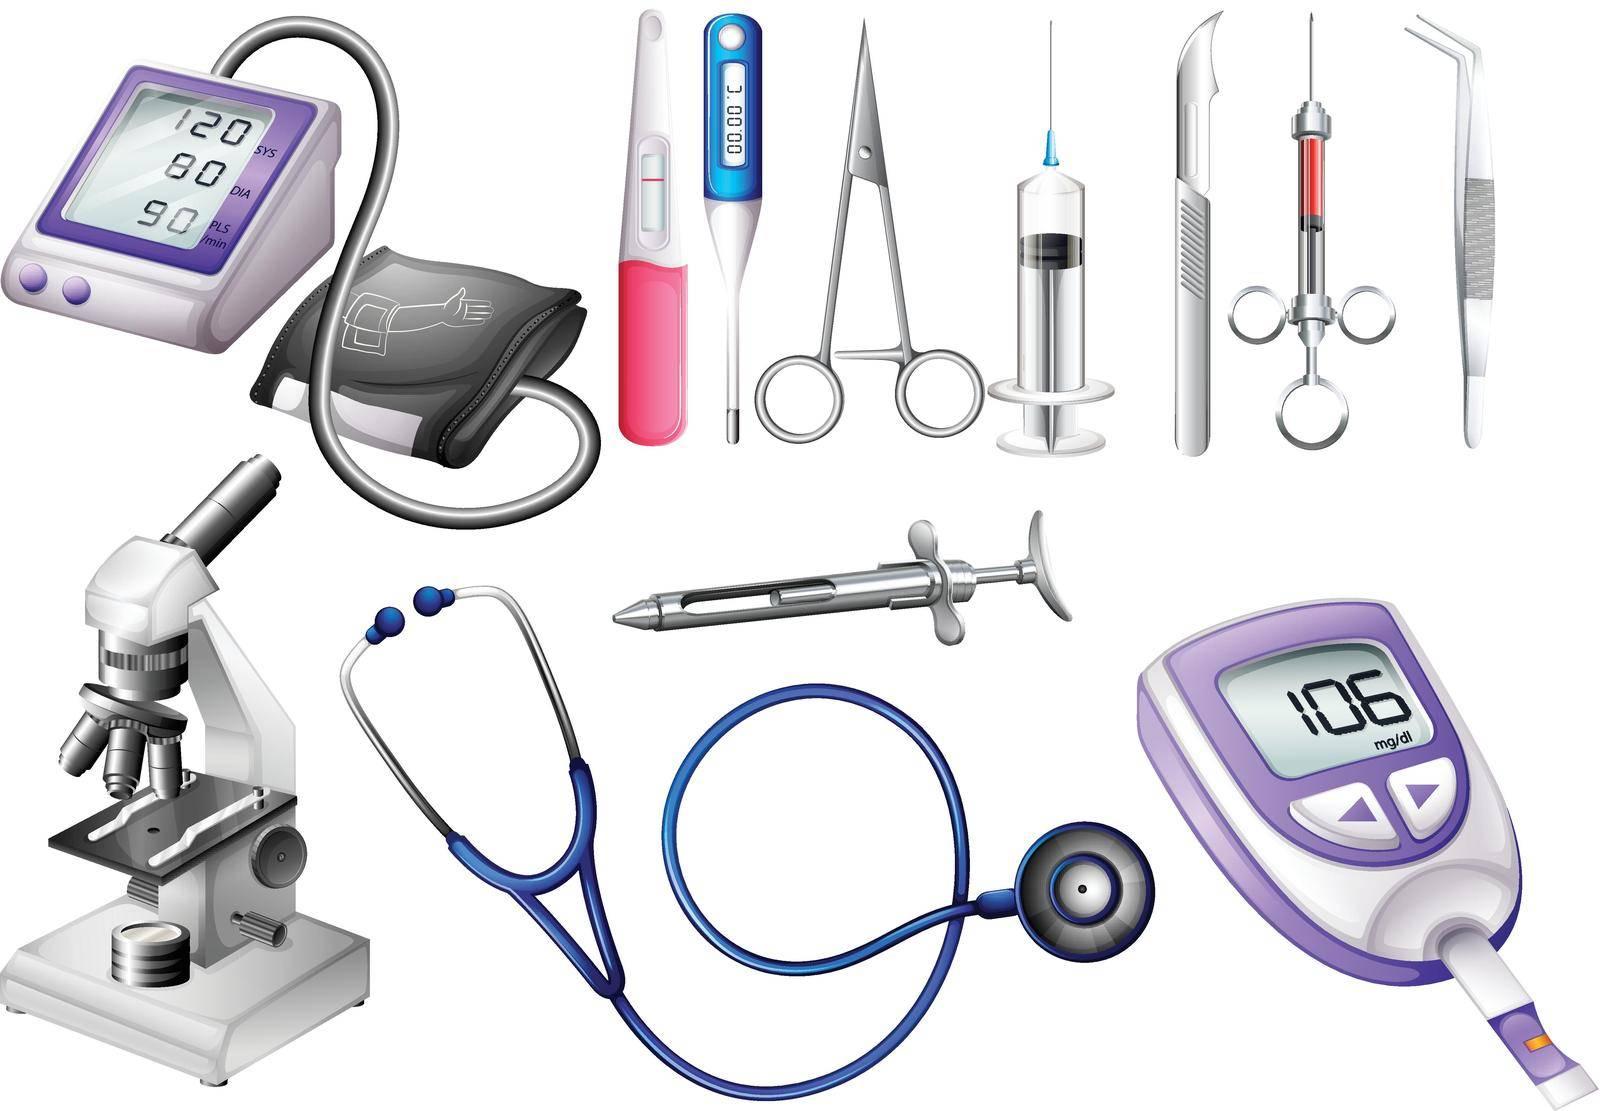 Set of medical equipment illustration